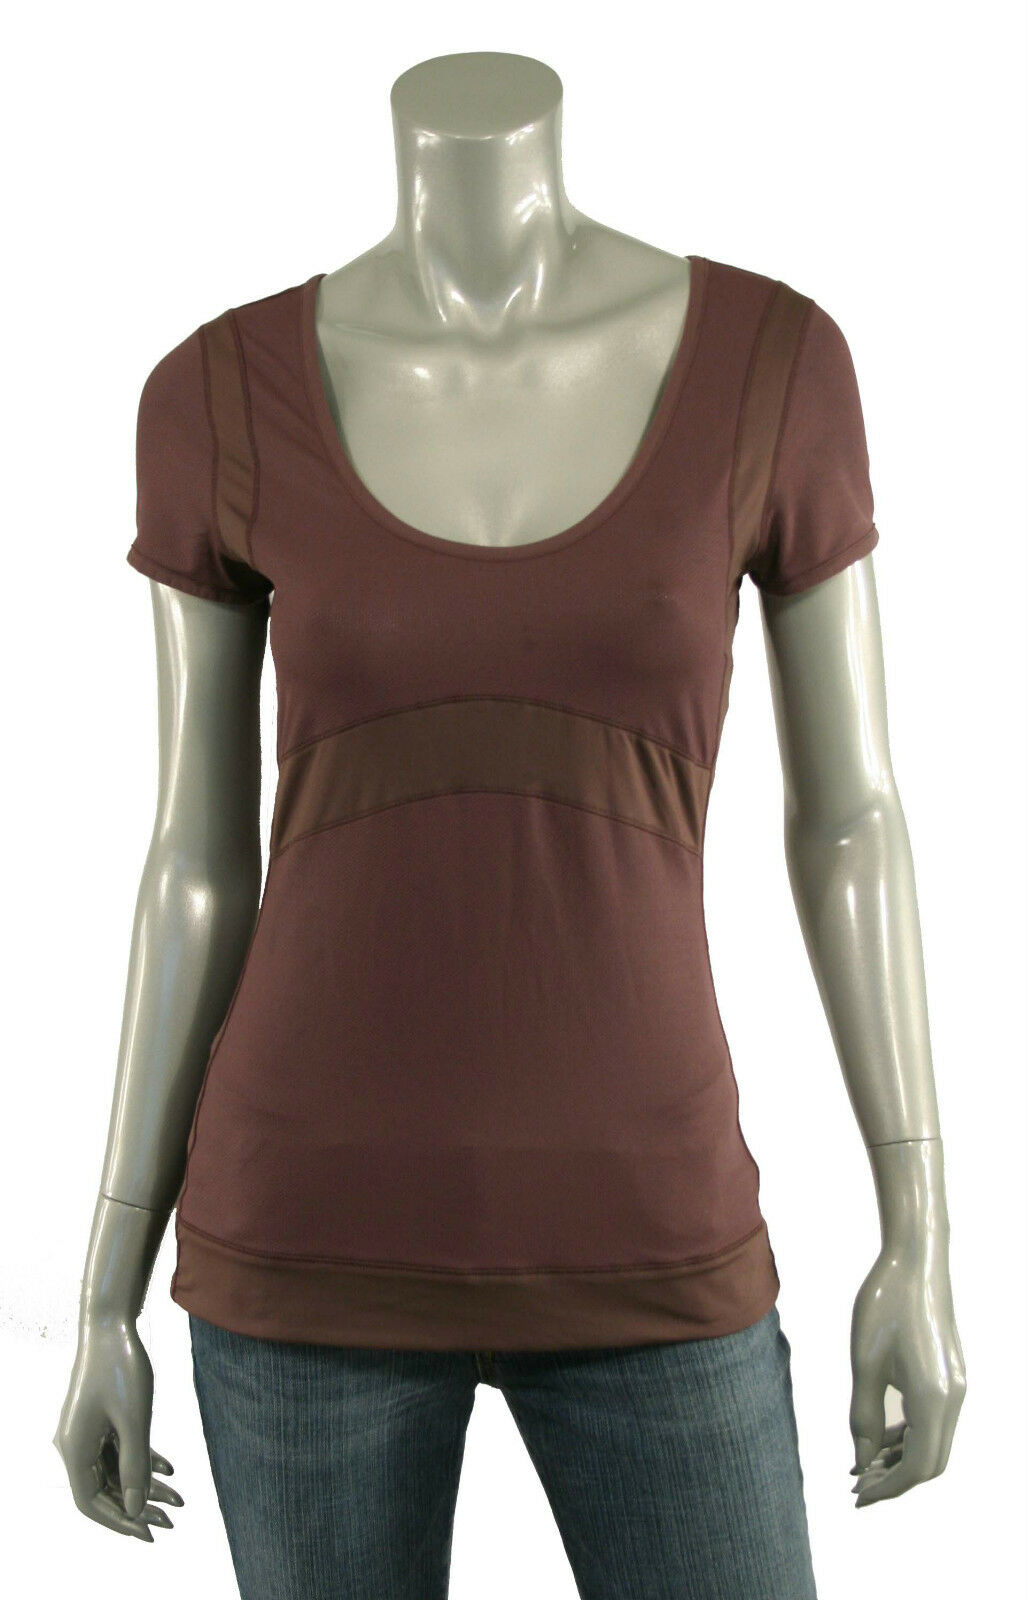 Adidas Stella McCartney Run Core Tee Shirt New